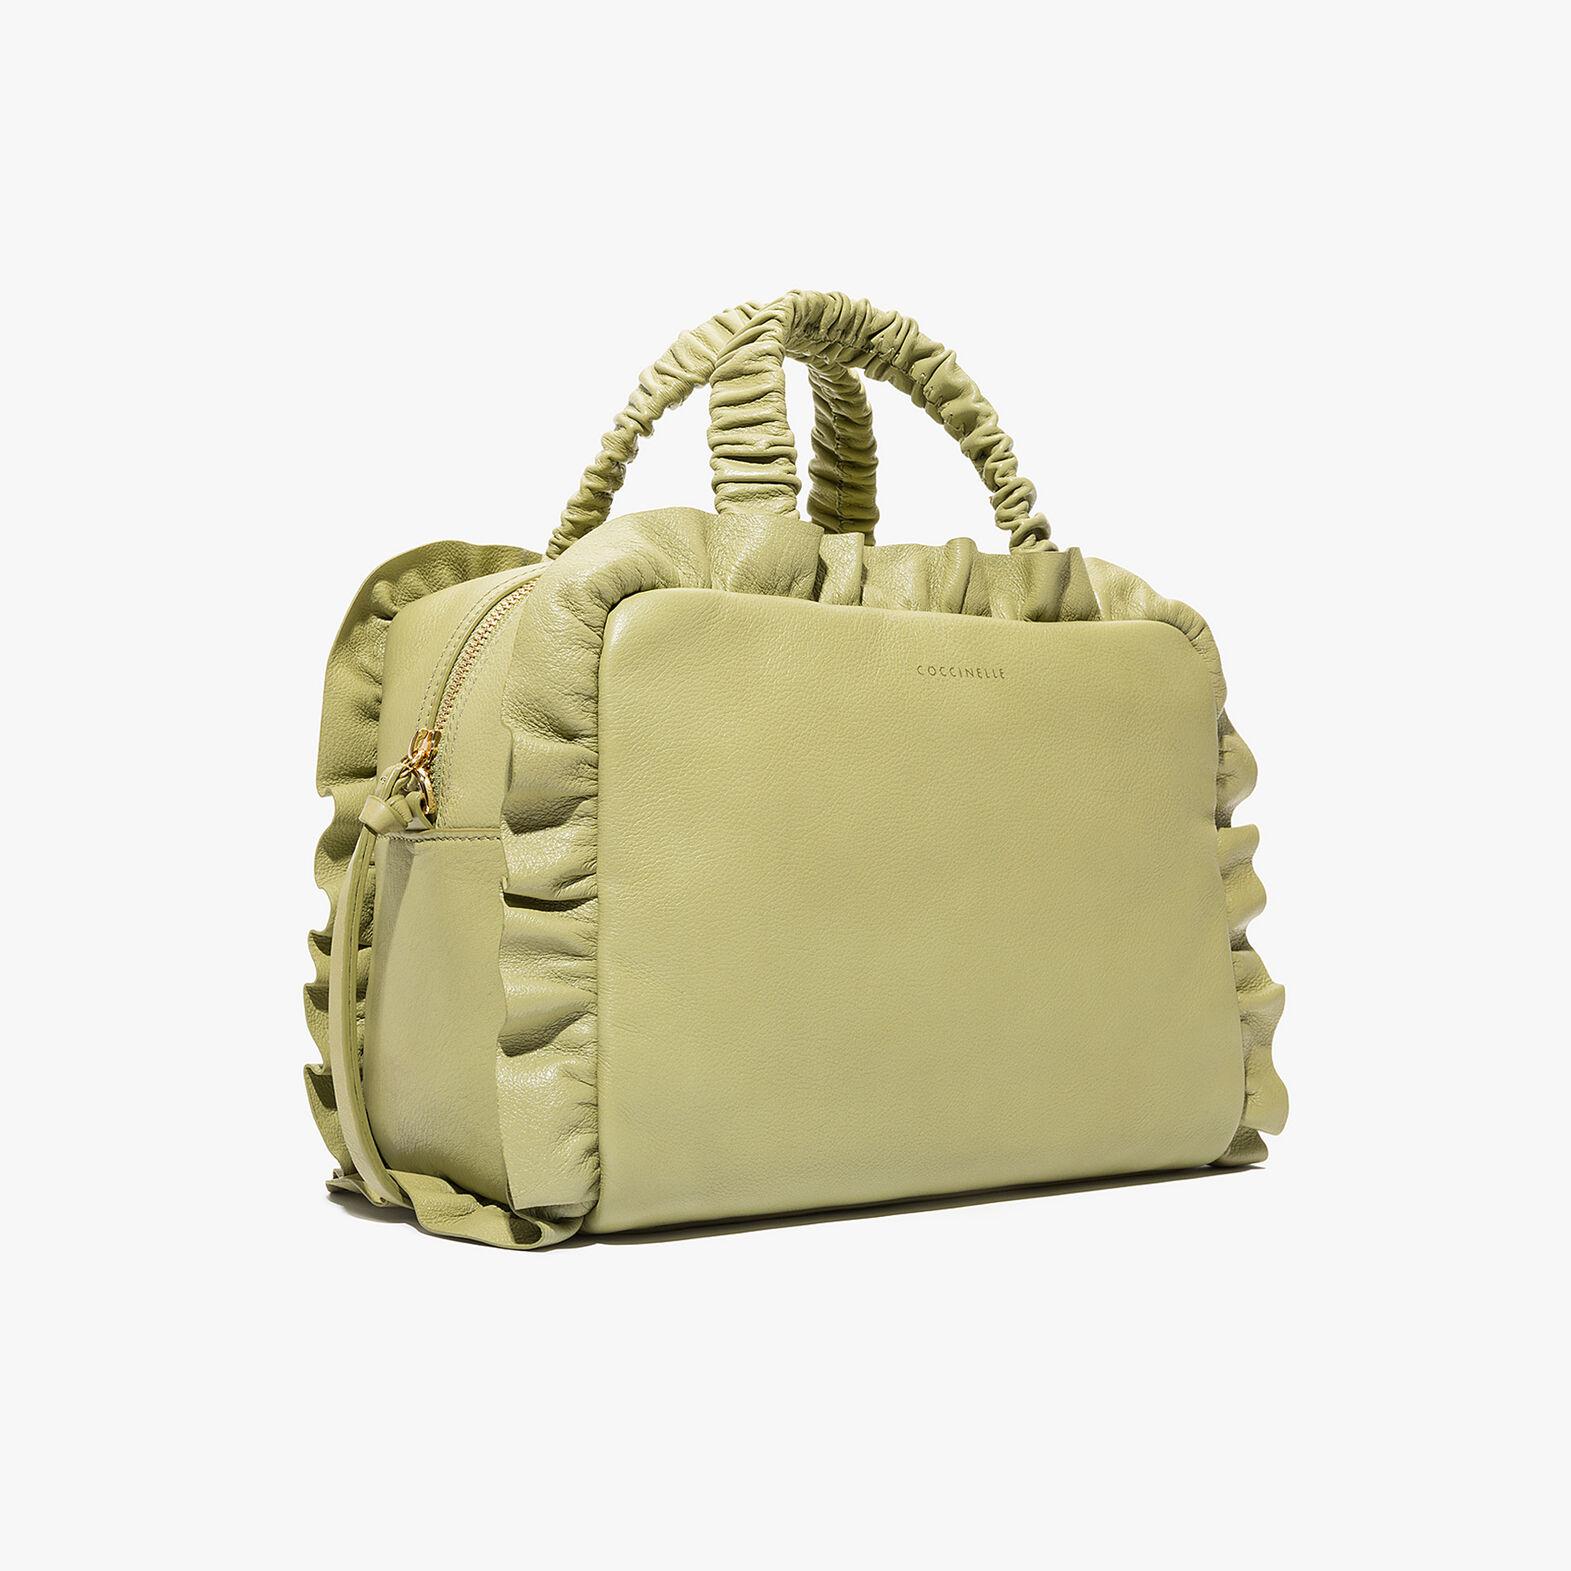 Brune leather handbag